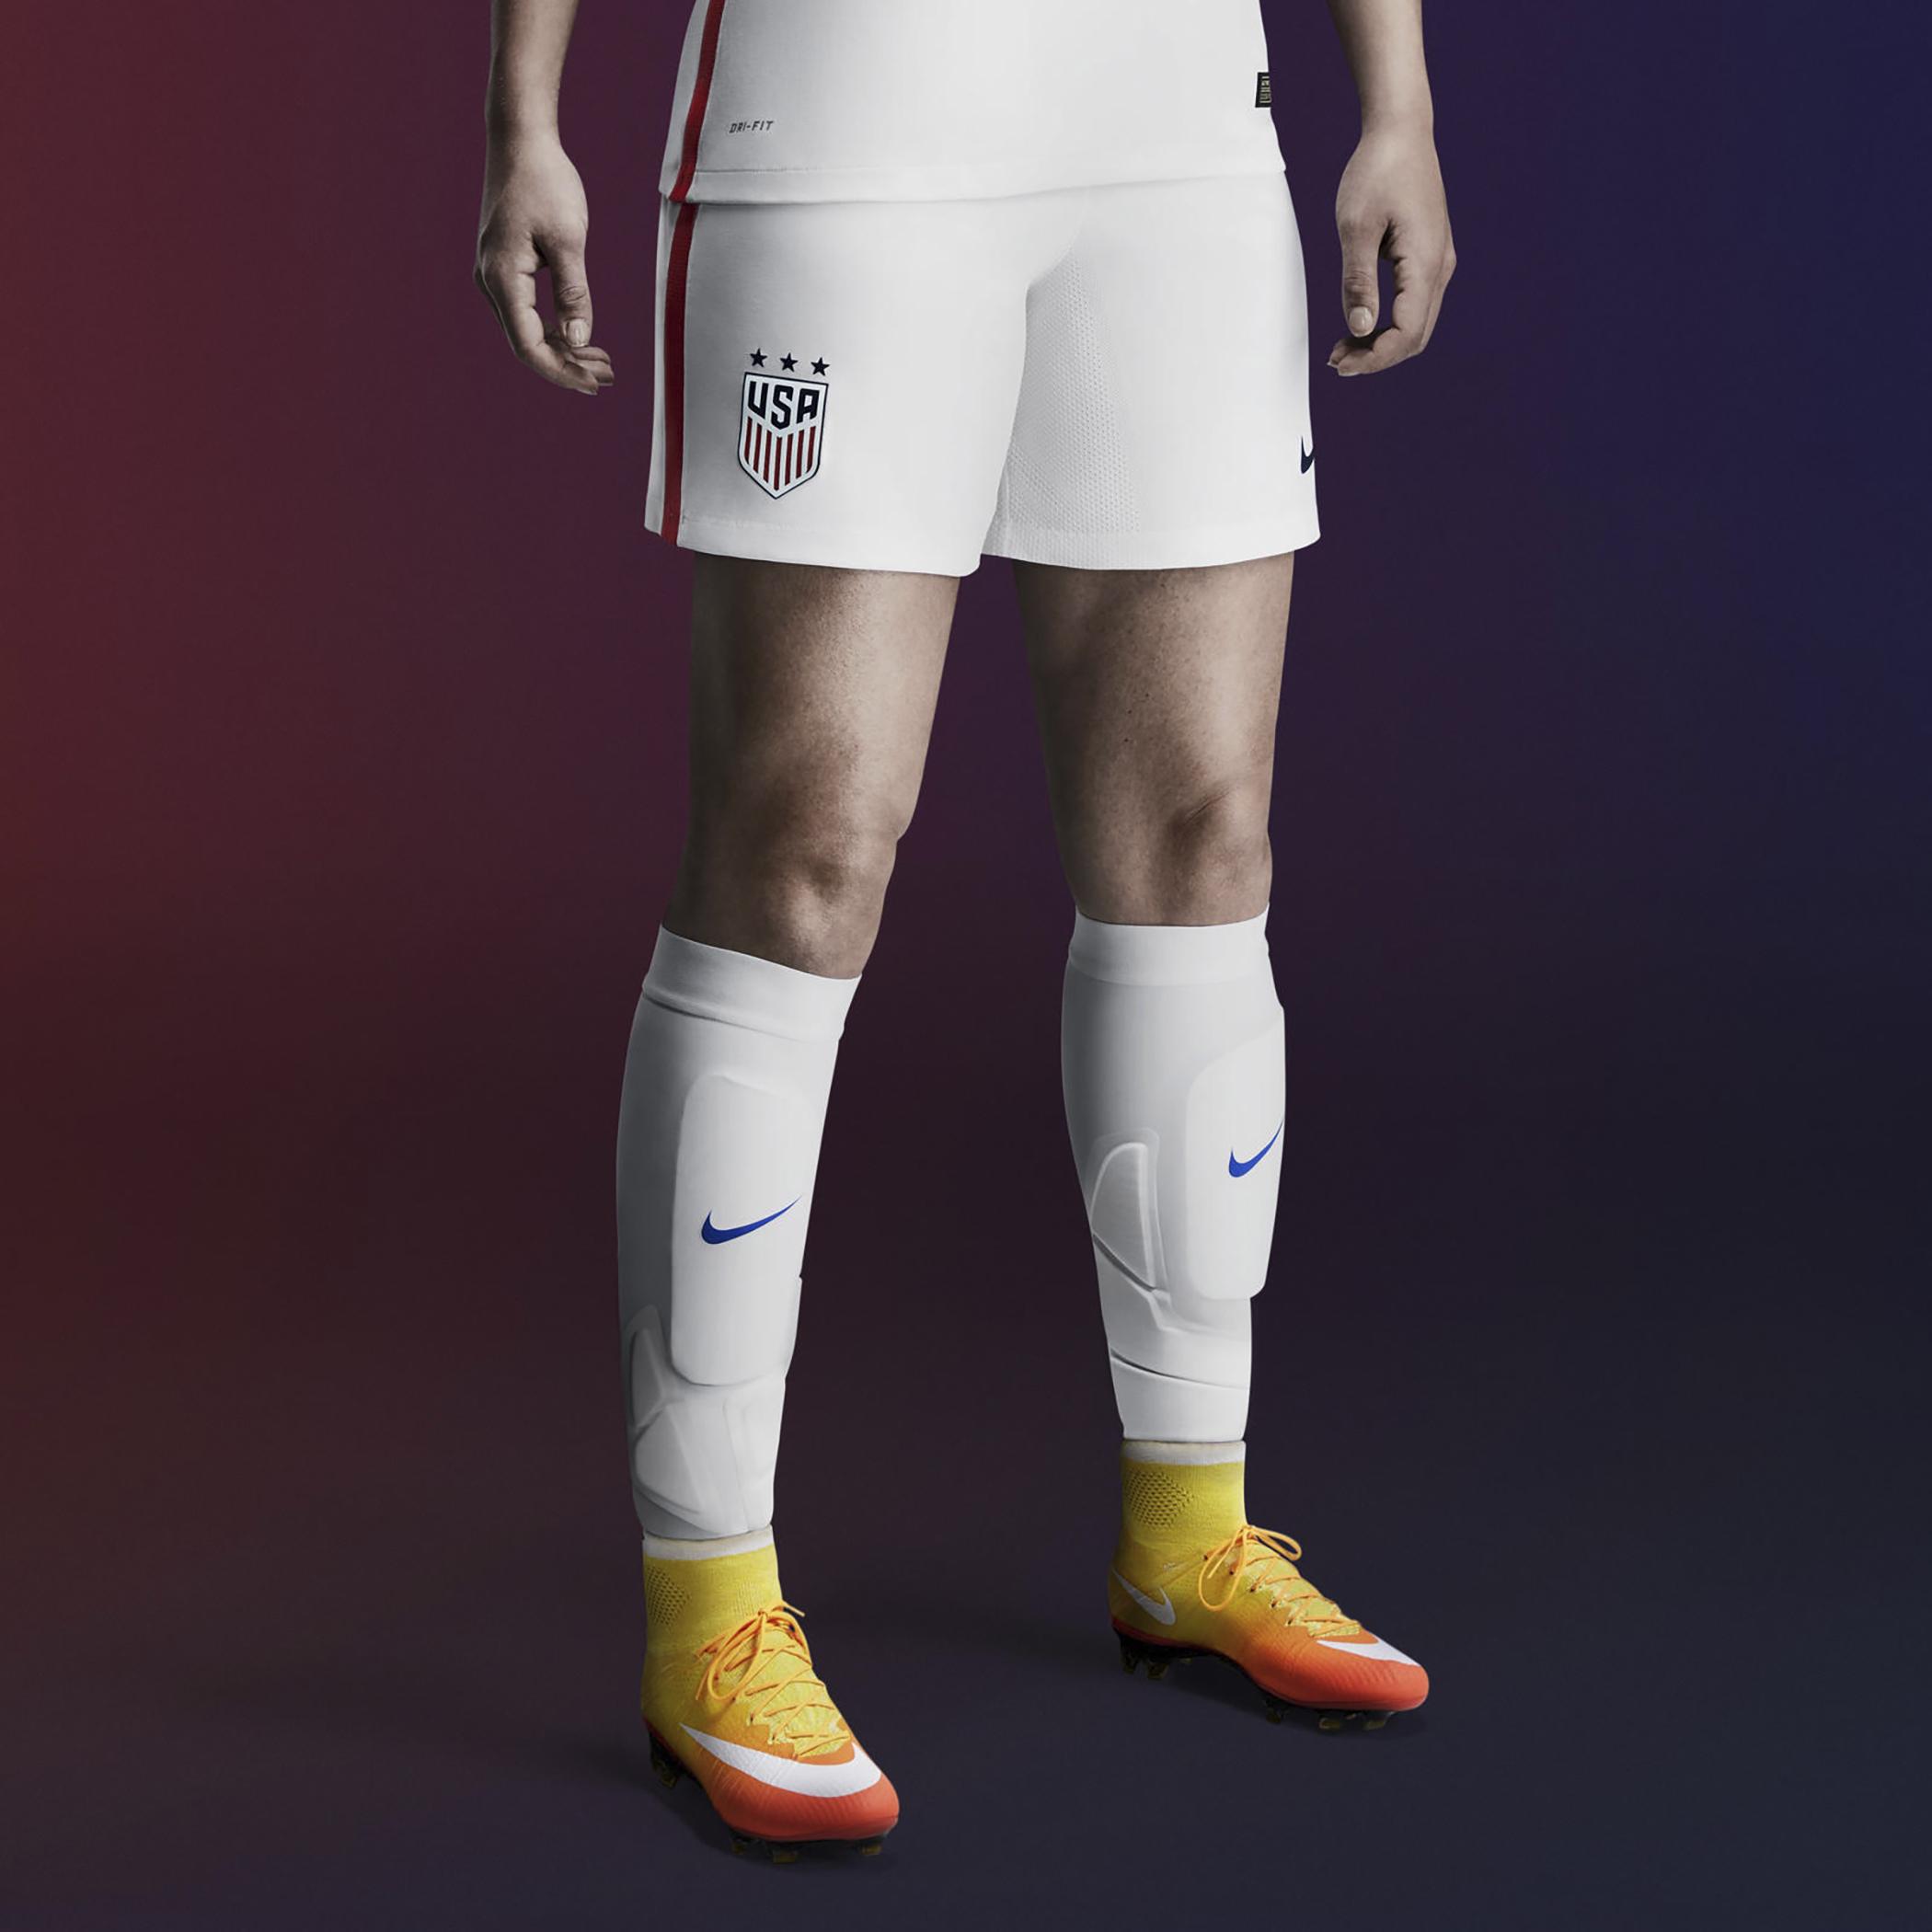 160915_GAL_Plastic_Nike